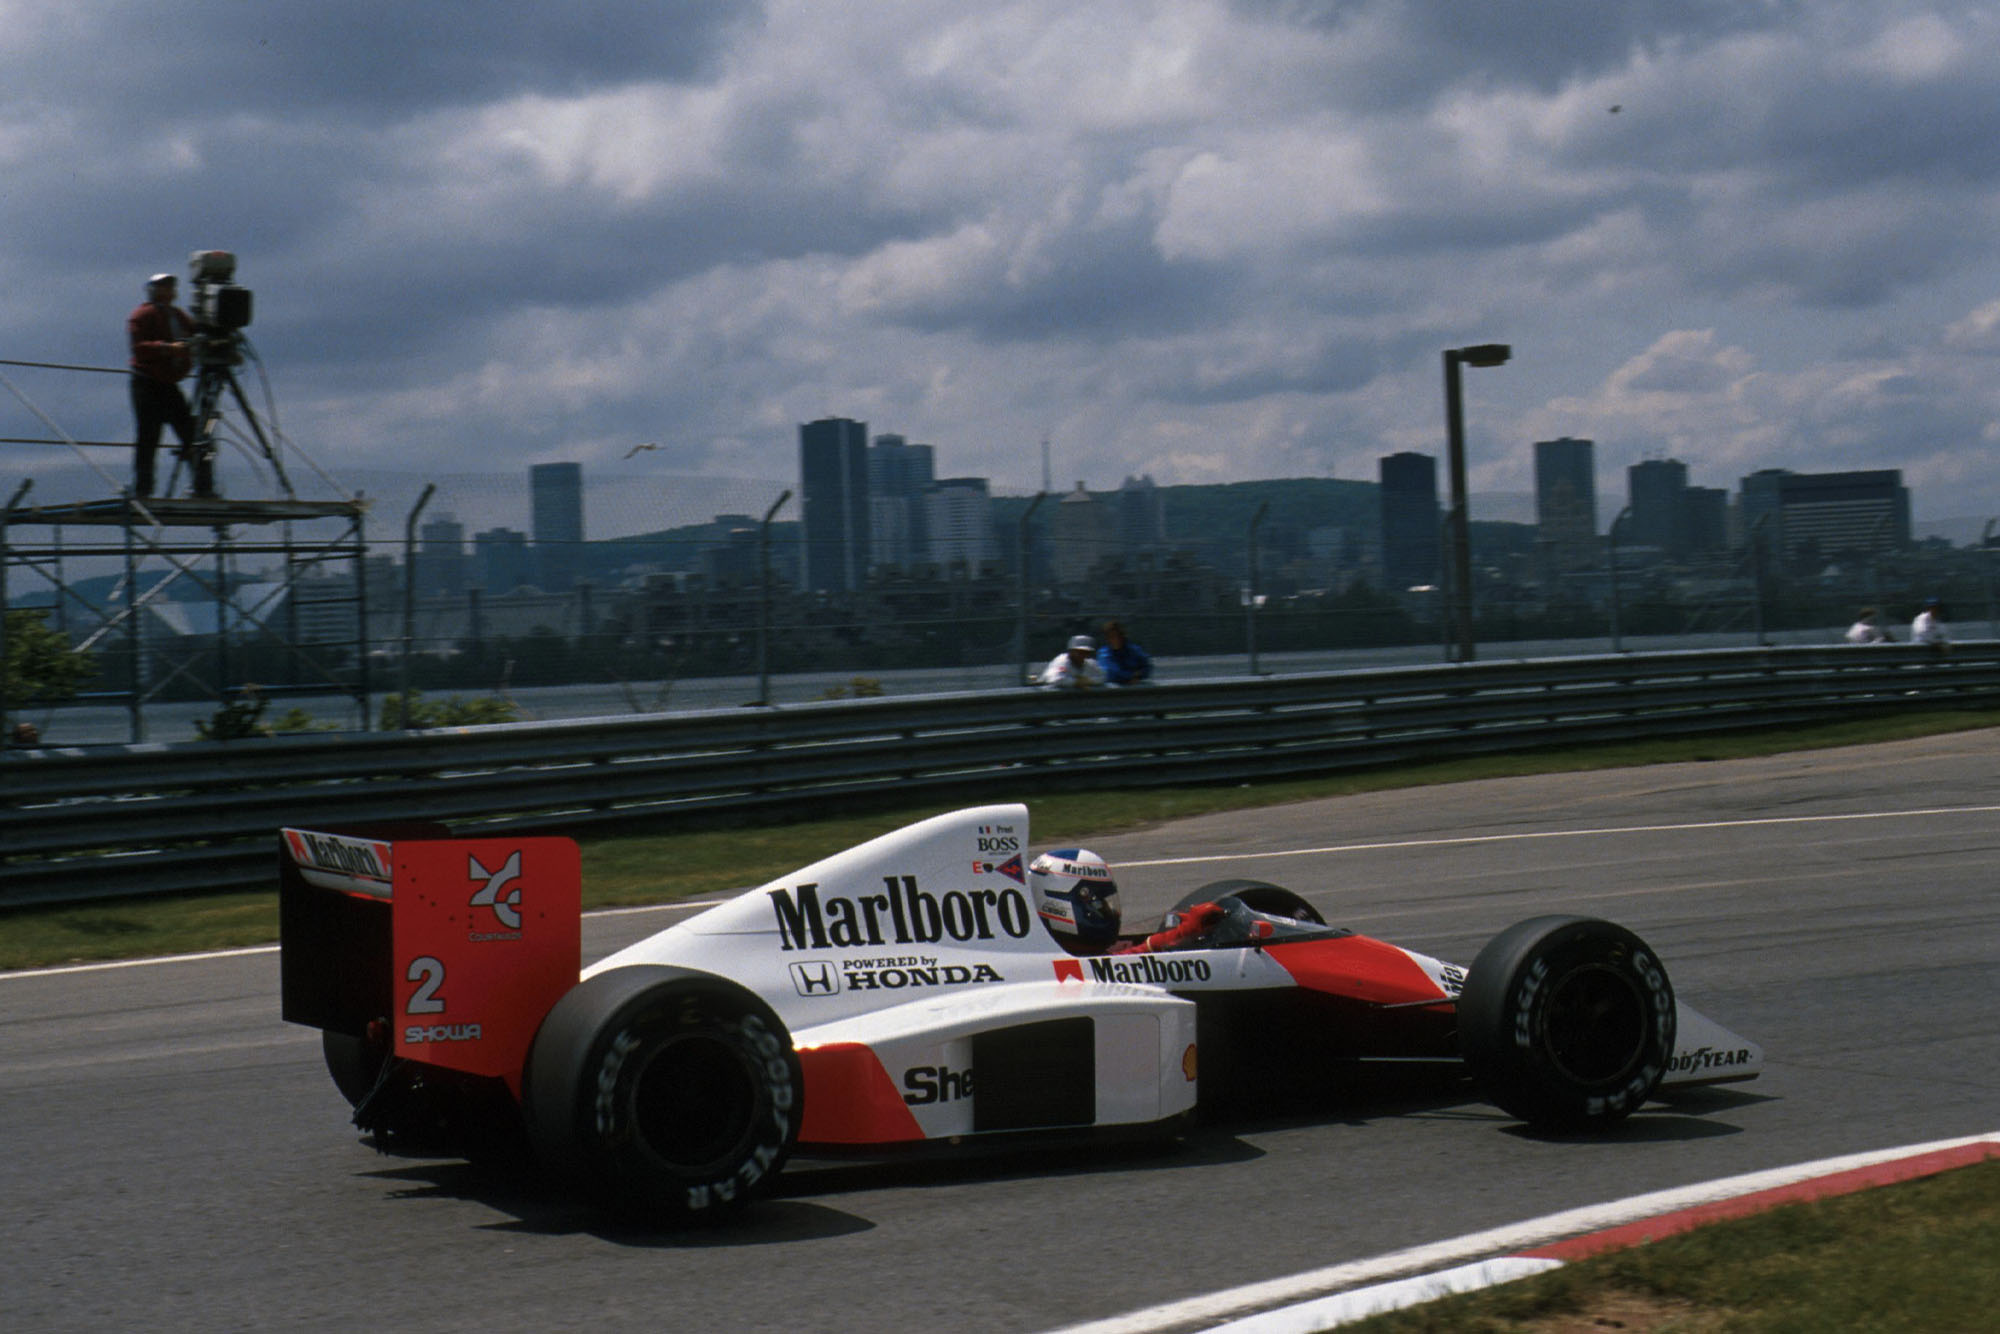 1989 Canadian GP pole